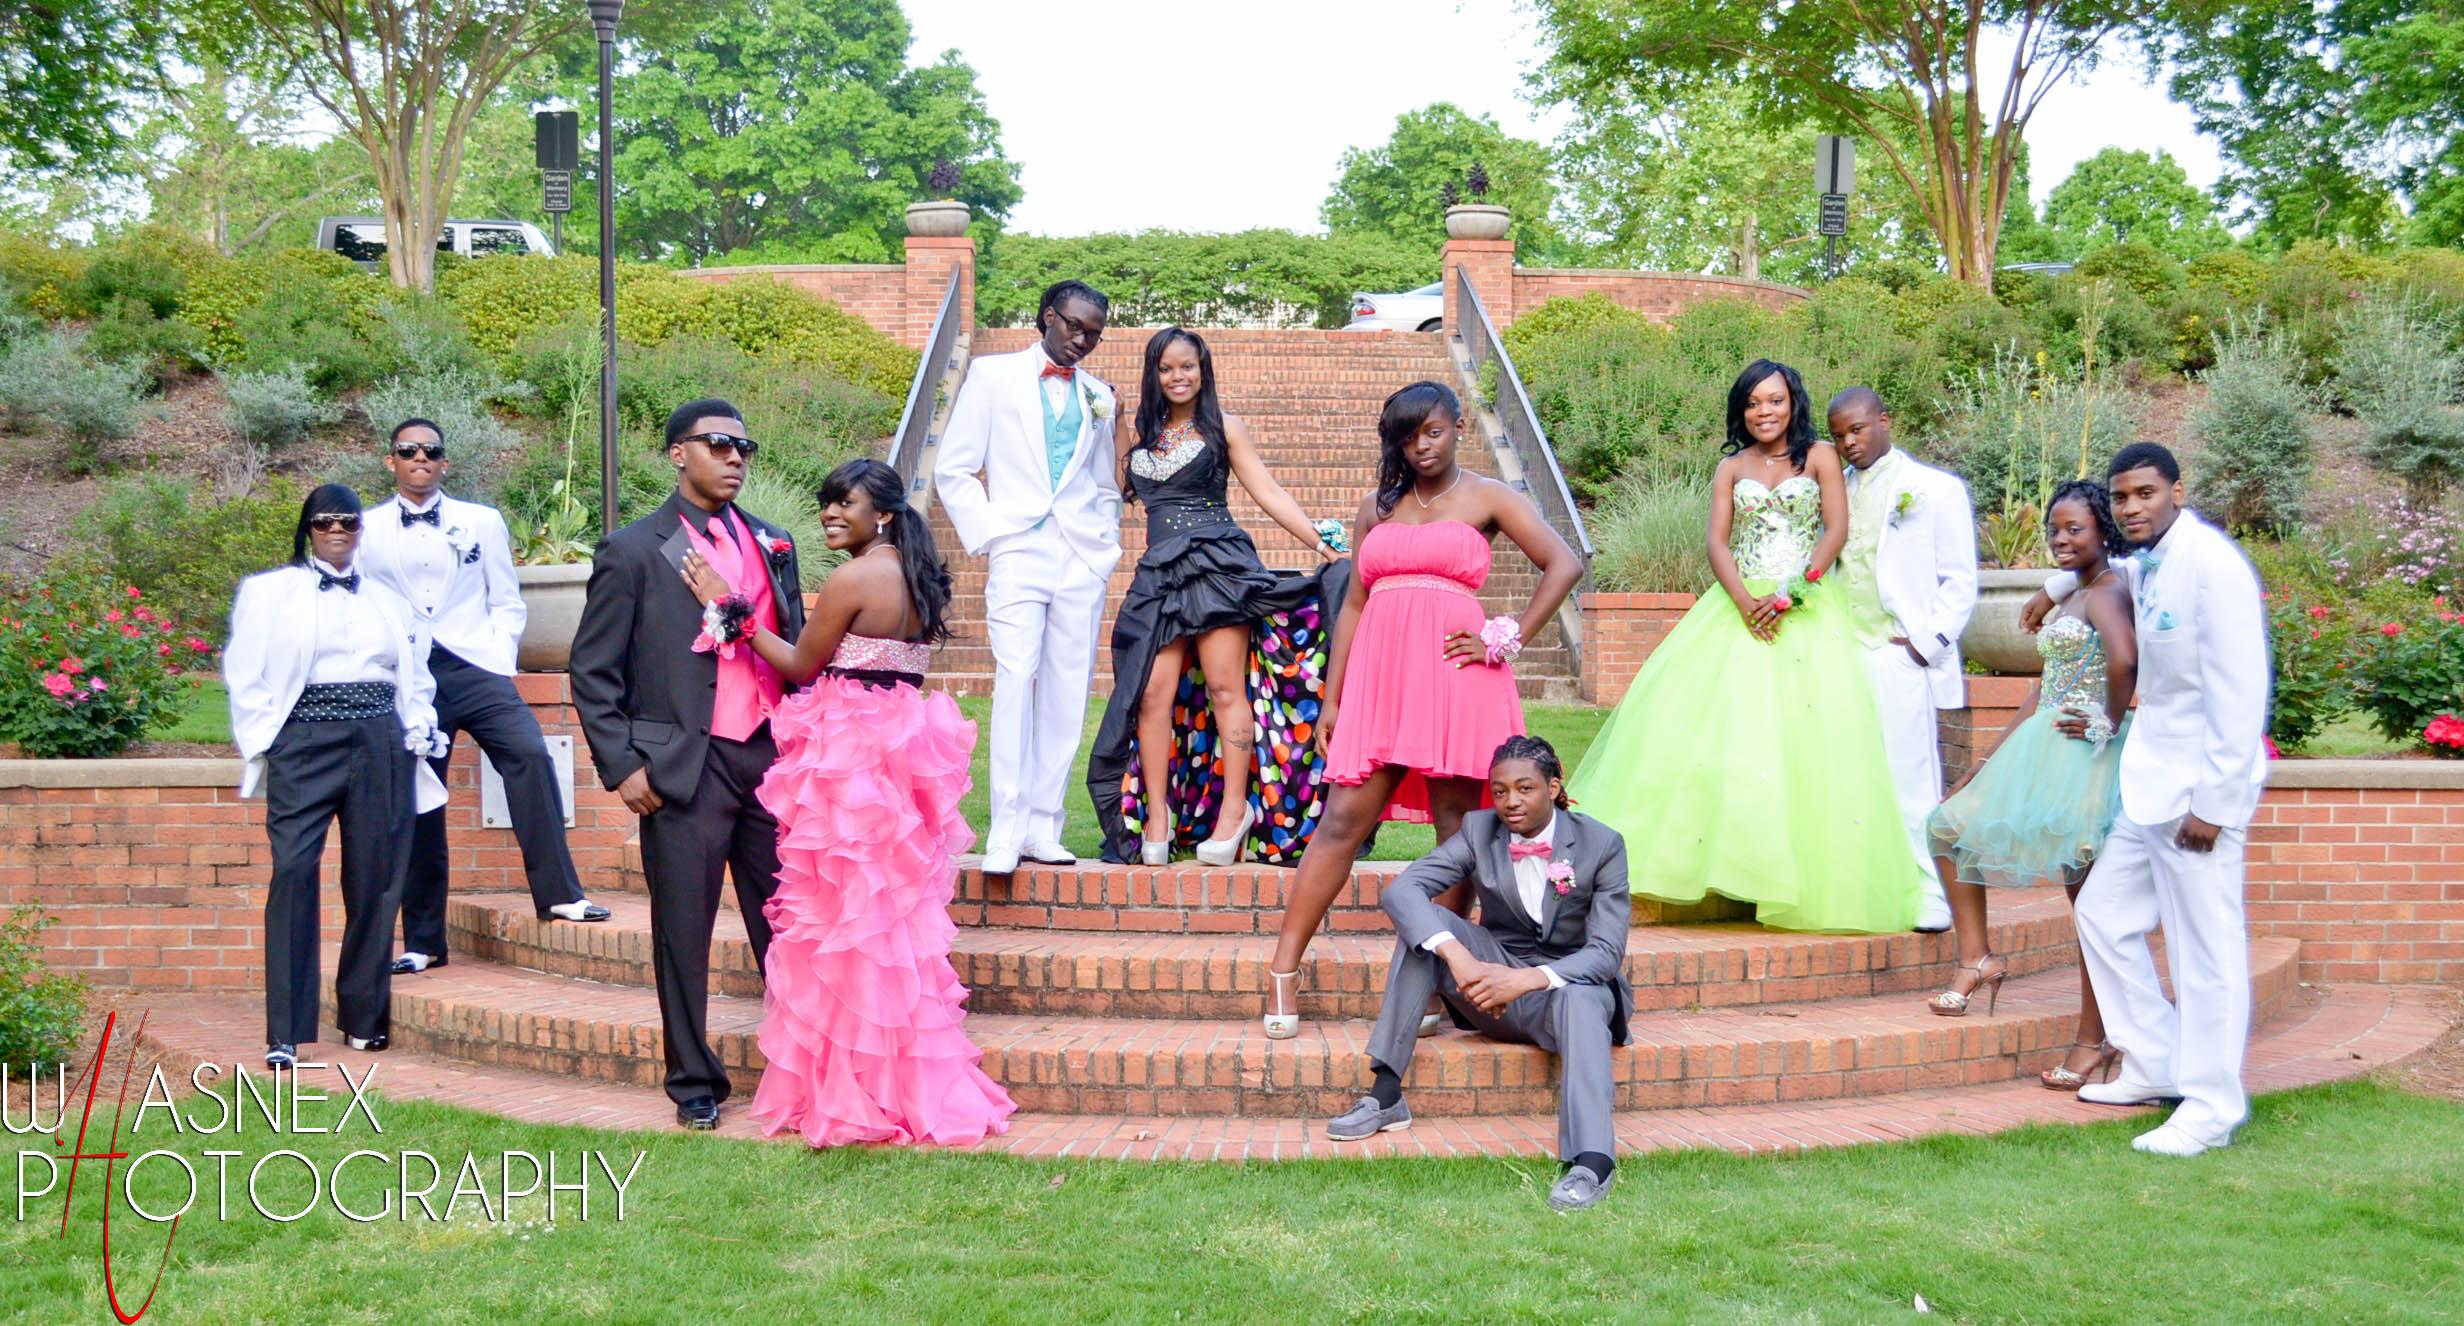 LHS Prom (2)